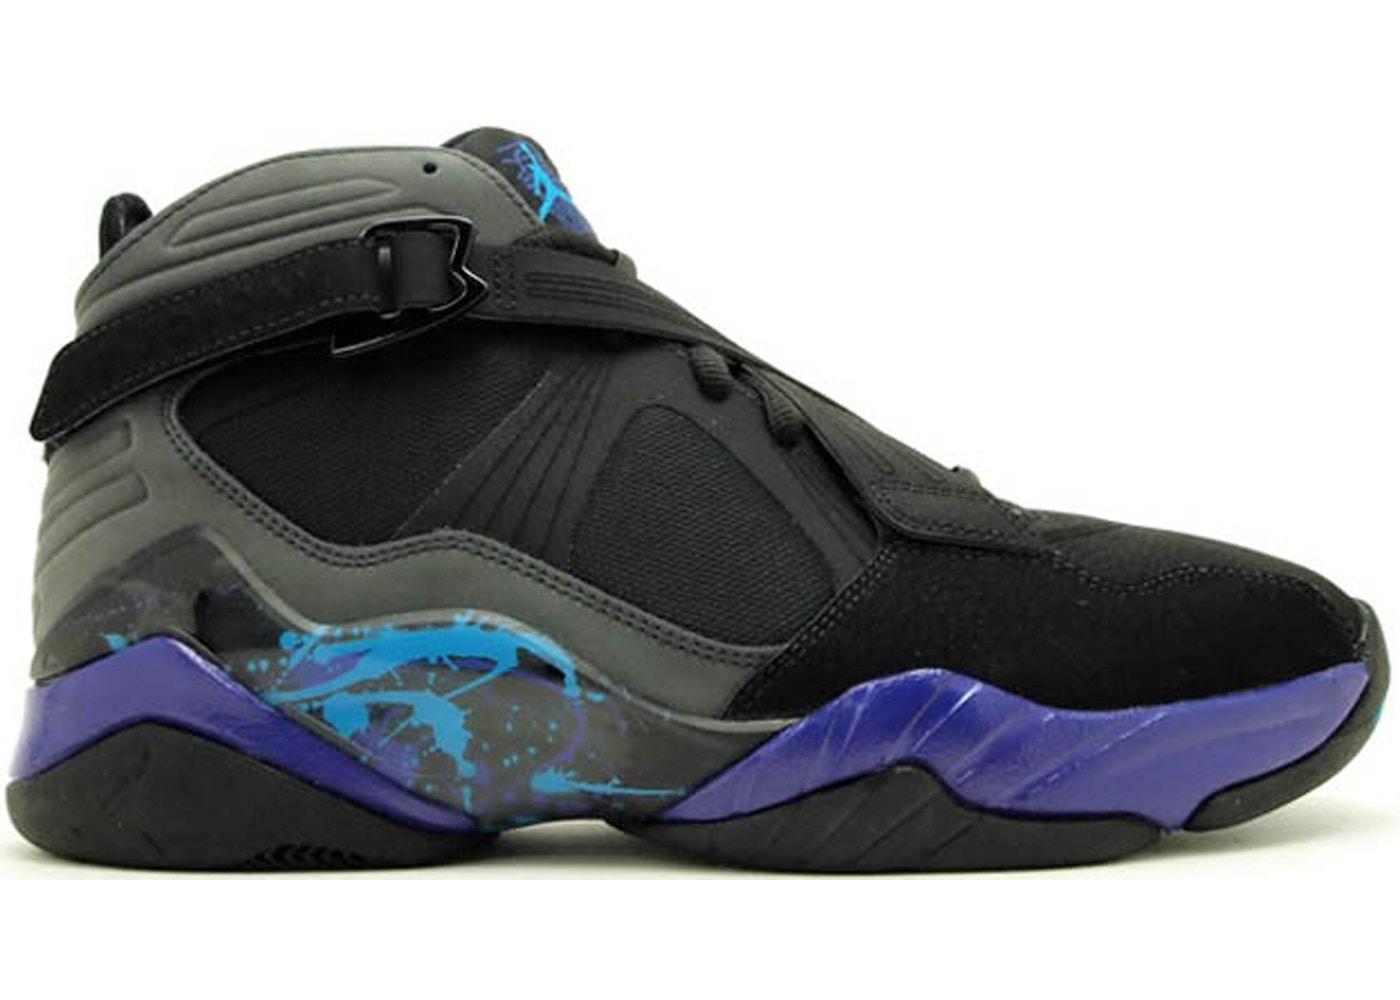 on sale ad634 31647 Jordan 8.0 Aqua